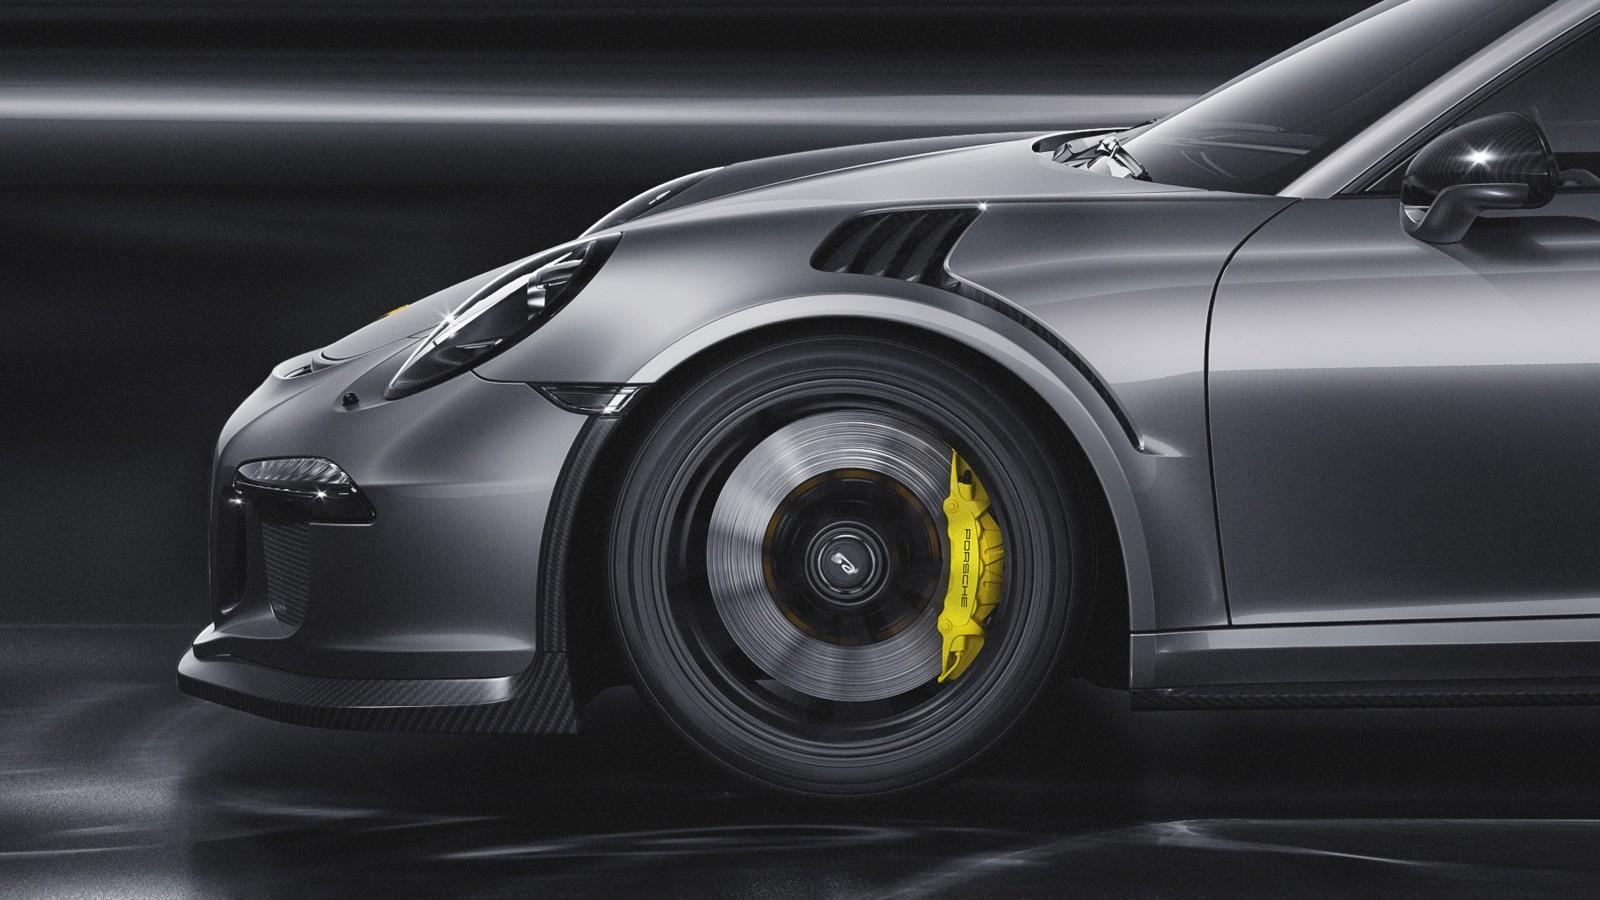 Porsche Gt Rs Cgi X on Acura Rs